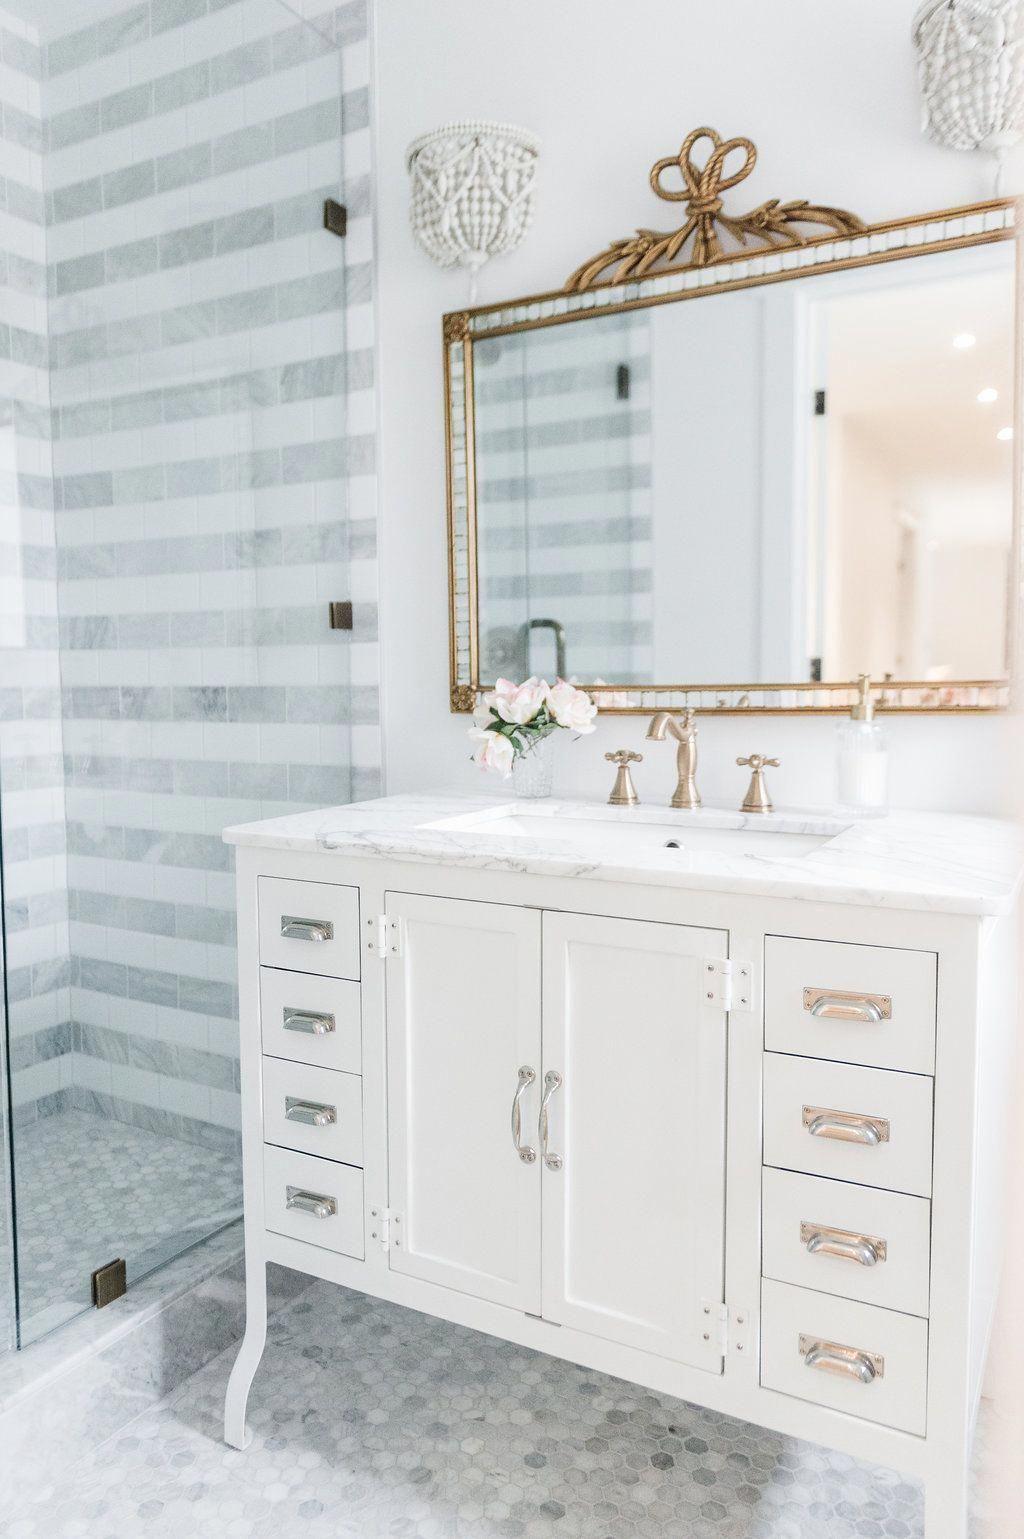 Marvelous Bathroom Decor Accessories Ideas Green Bathroom Download Free Architecture Designs Scobabritishbridgeorg